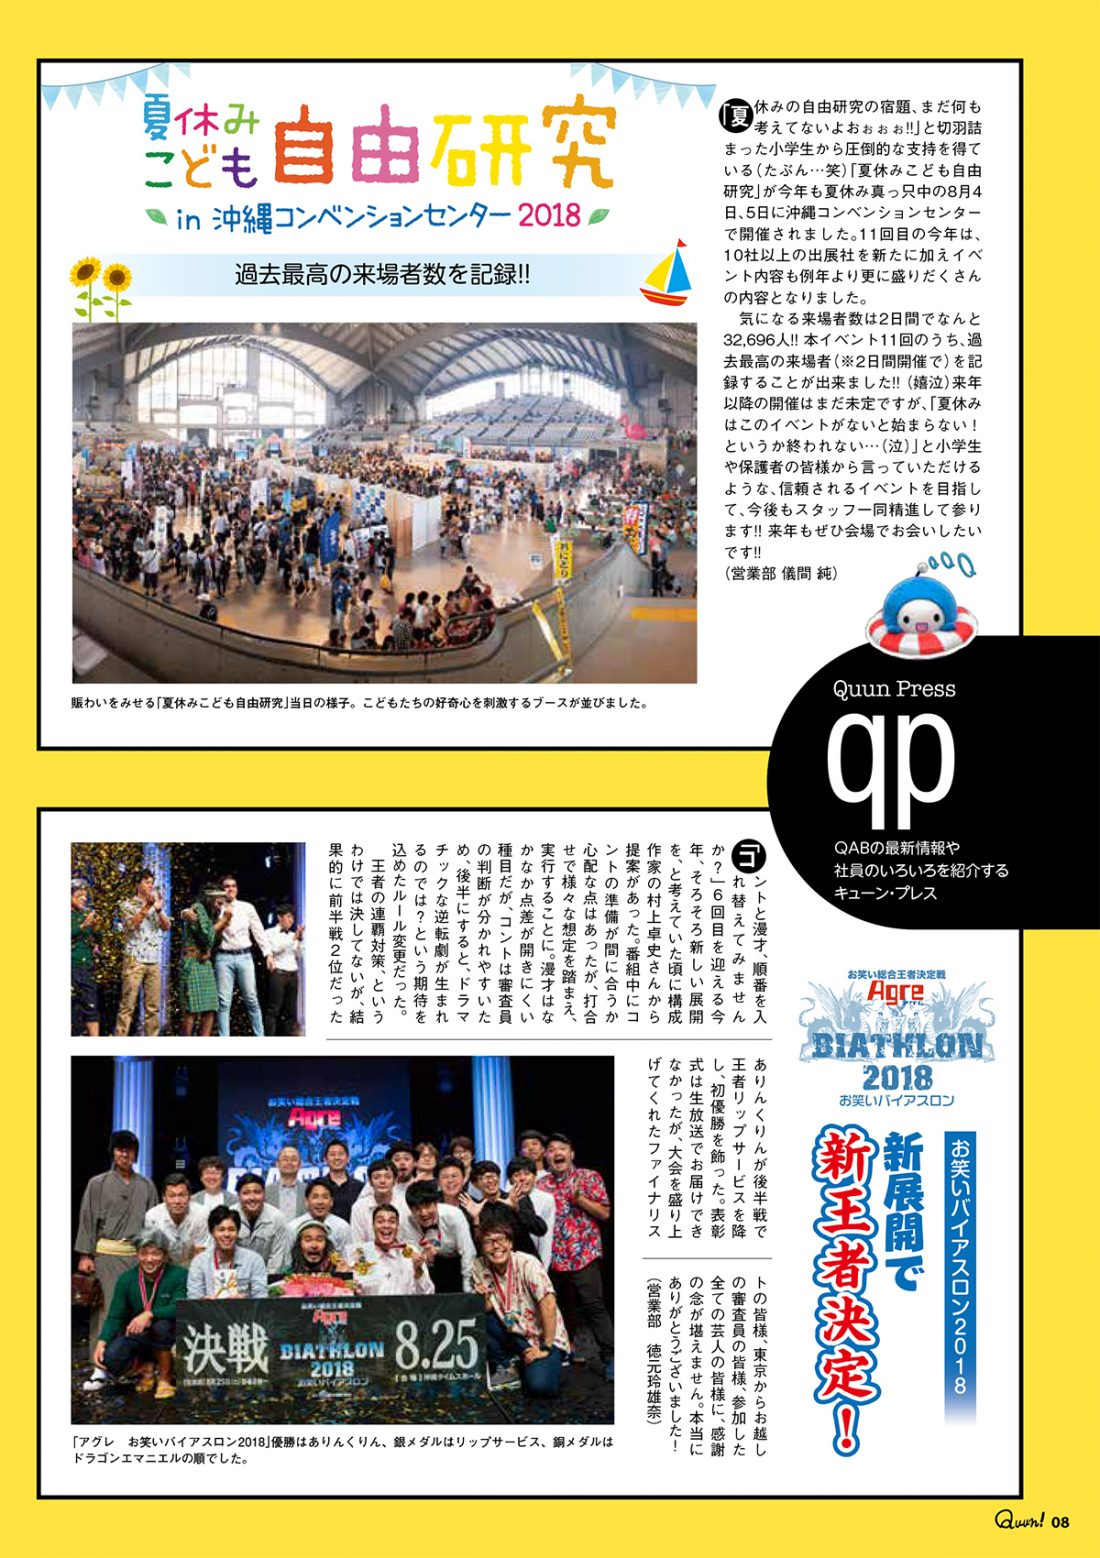 http://www.qab.co.jp/qgoro/wp-content/uploads/quun_1010-1100x1558.jpg